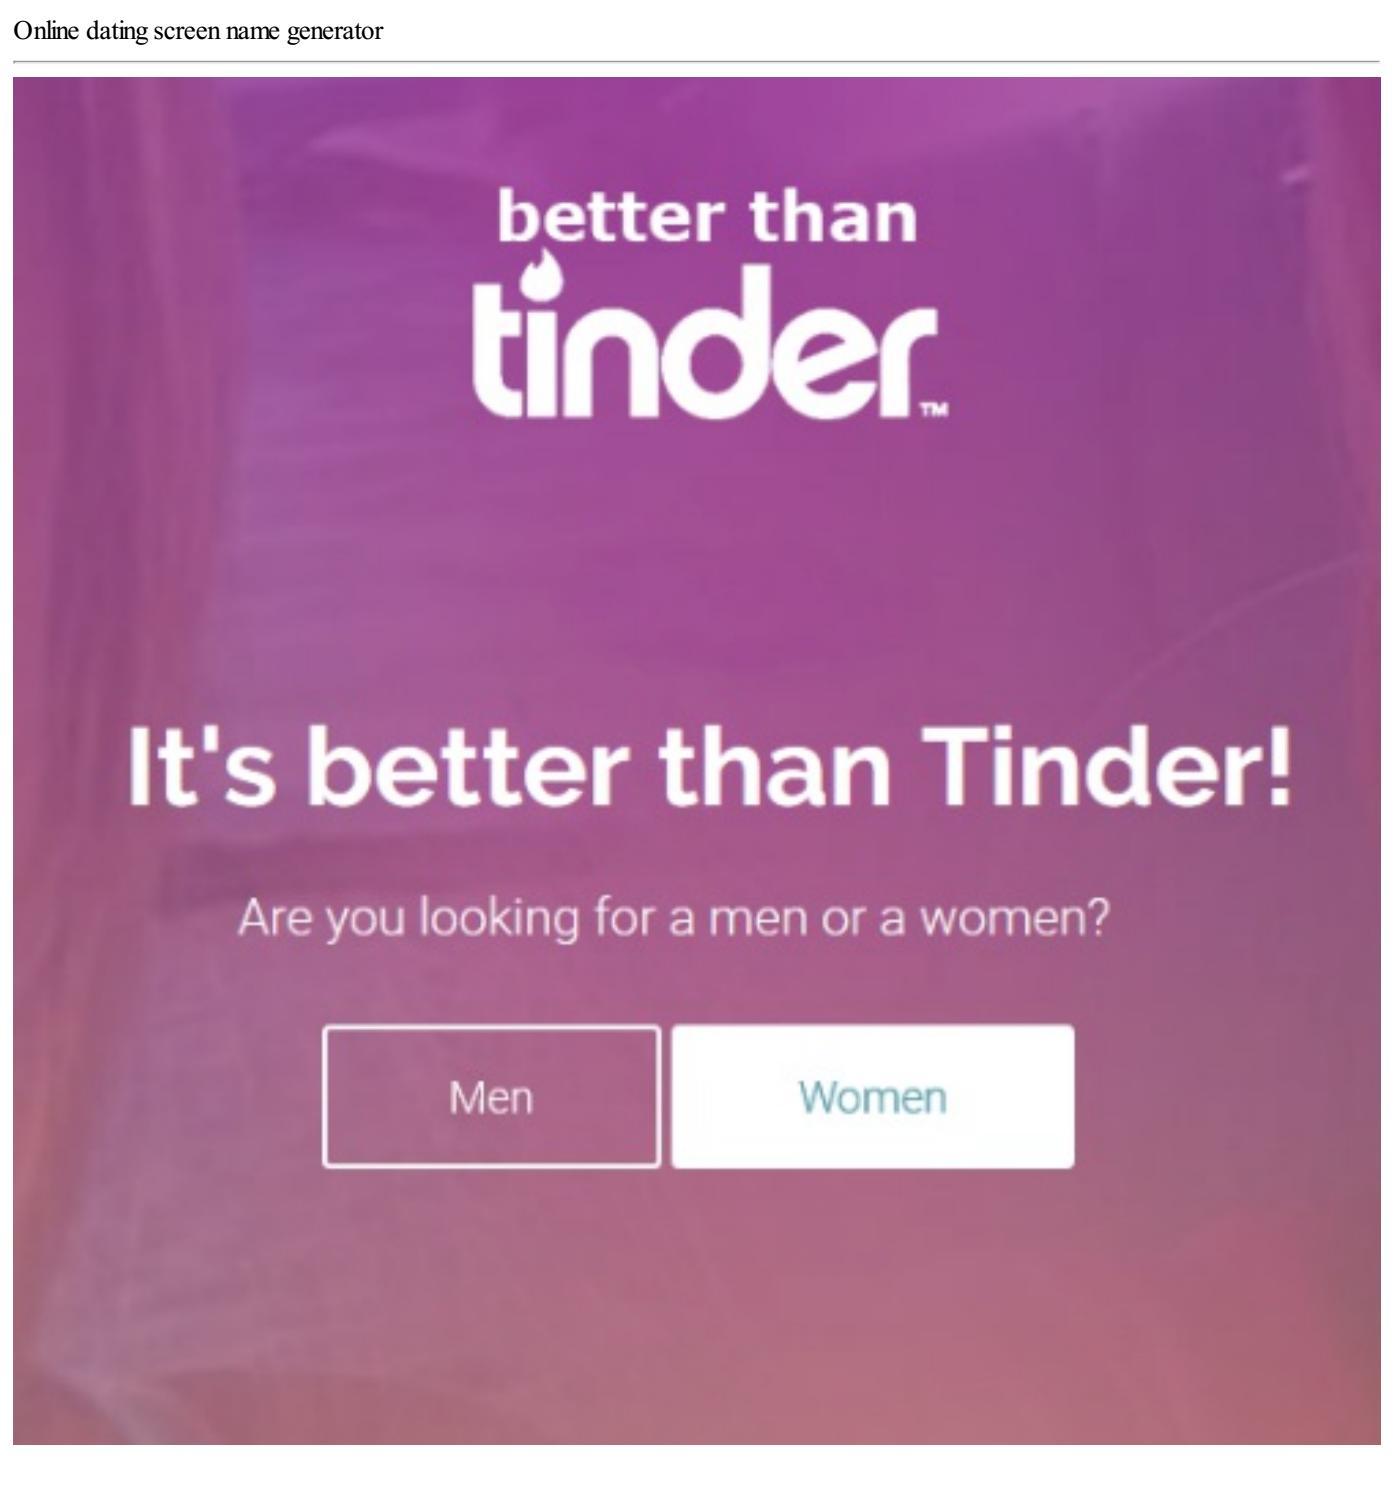 Screen name generator for dating site boston dating blog